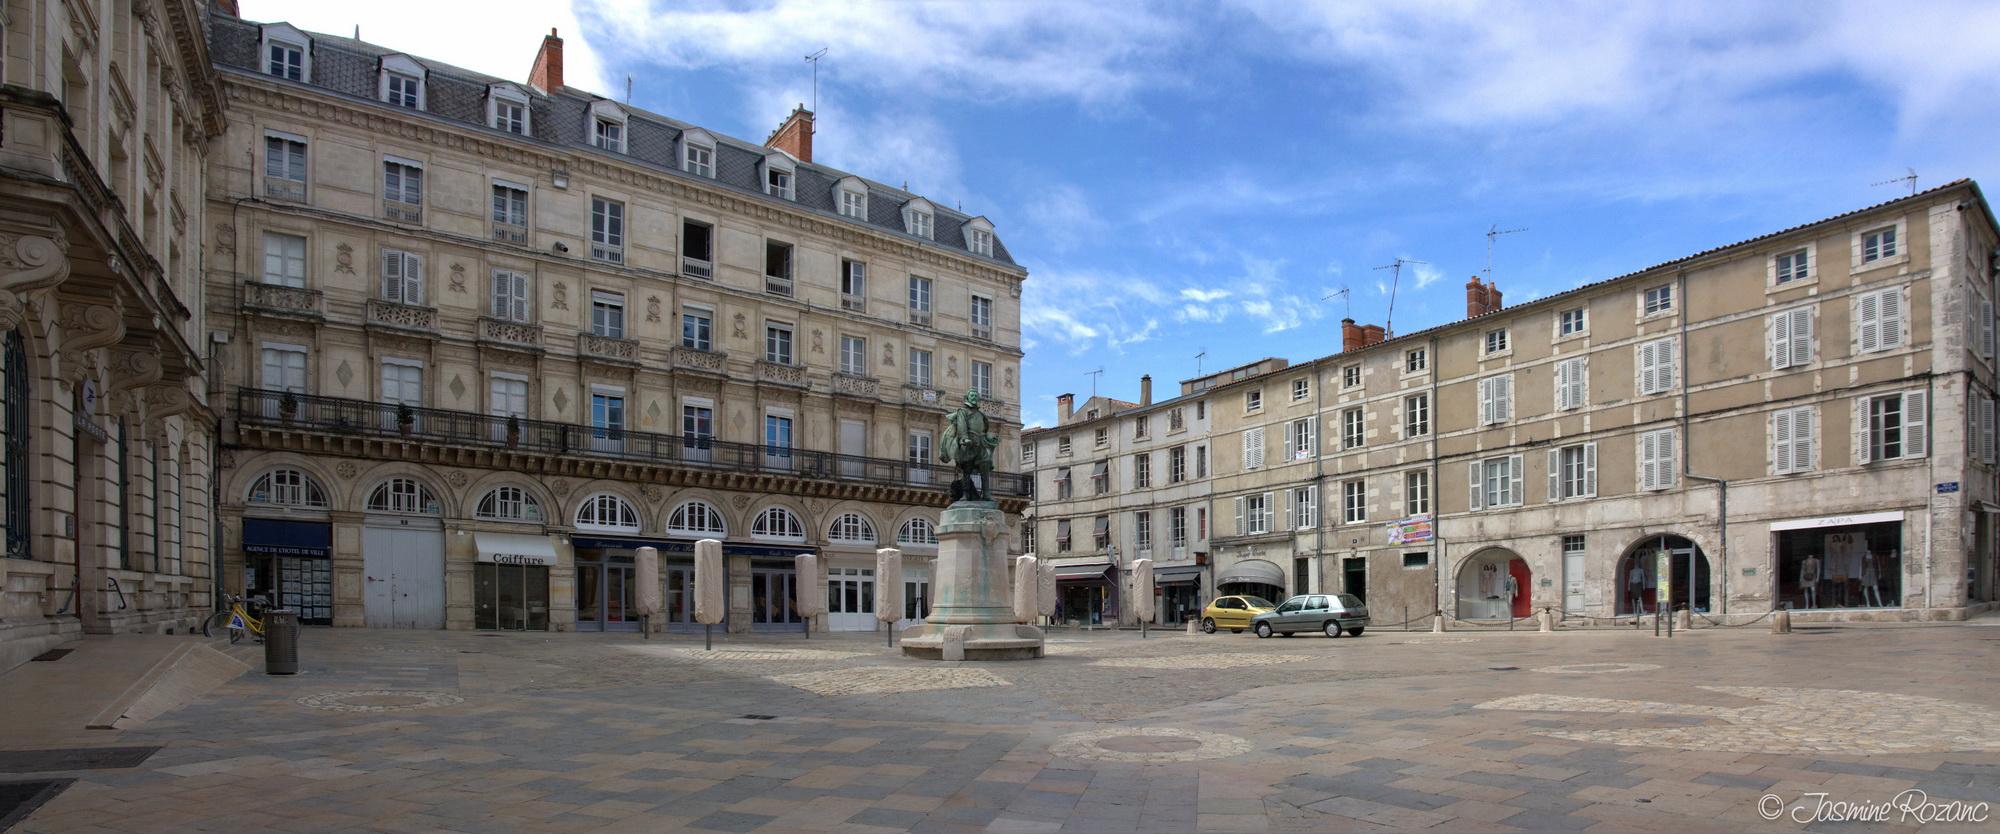 La rochelle for Hotel la rochelle piscine